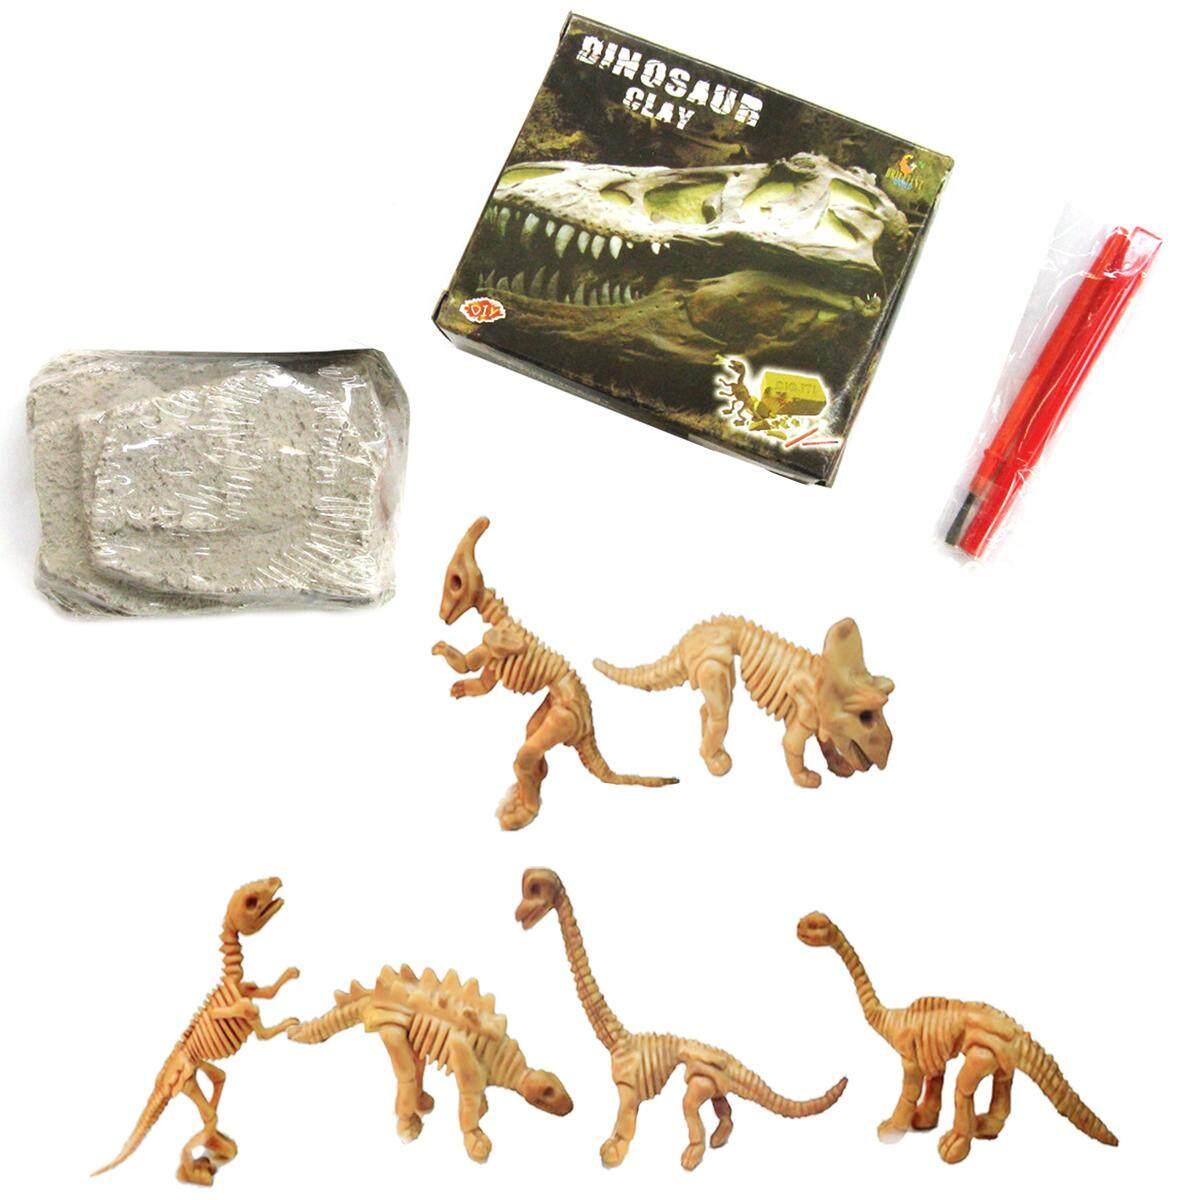 Dinosaur Bone Skeleton Dig Kit Dinosaur Fossil Excavation Kits DIY Science  Educational Toy for 6 Years+ Kids